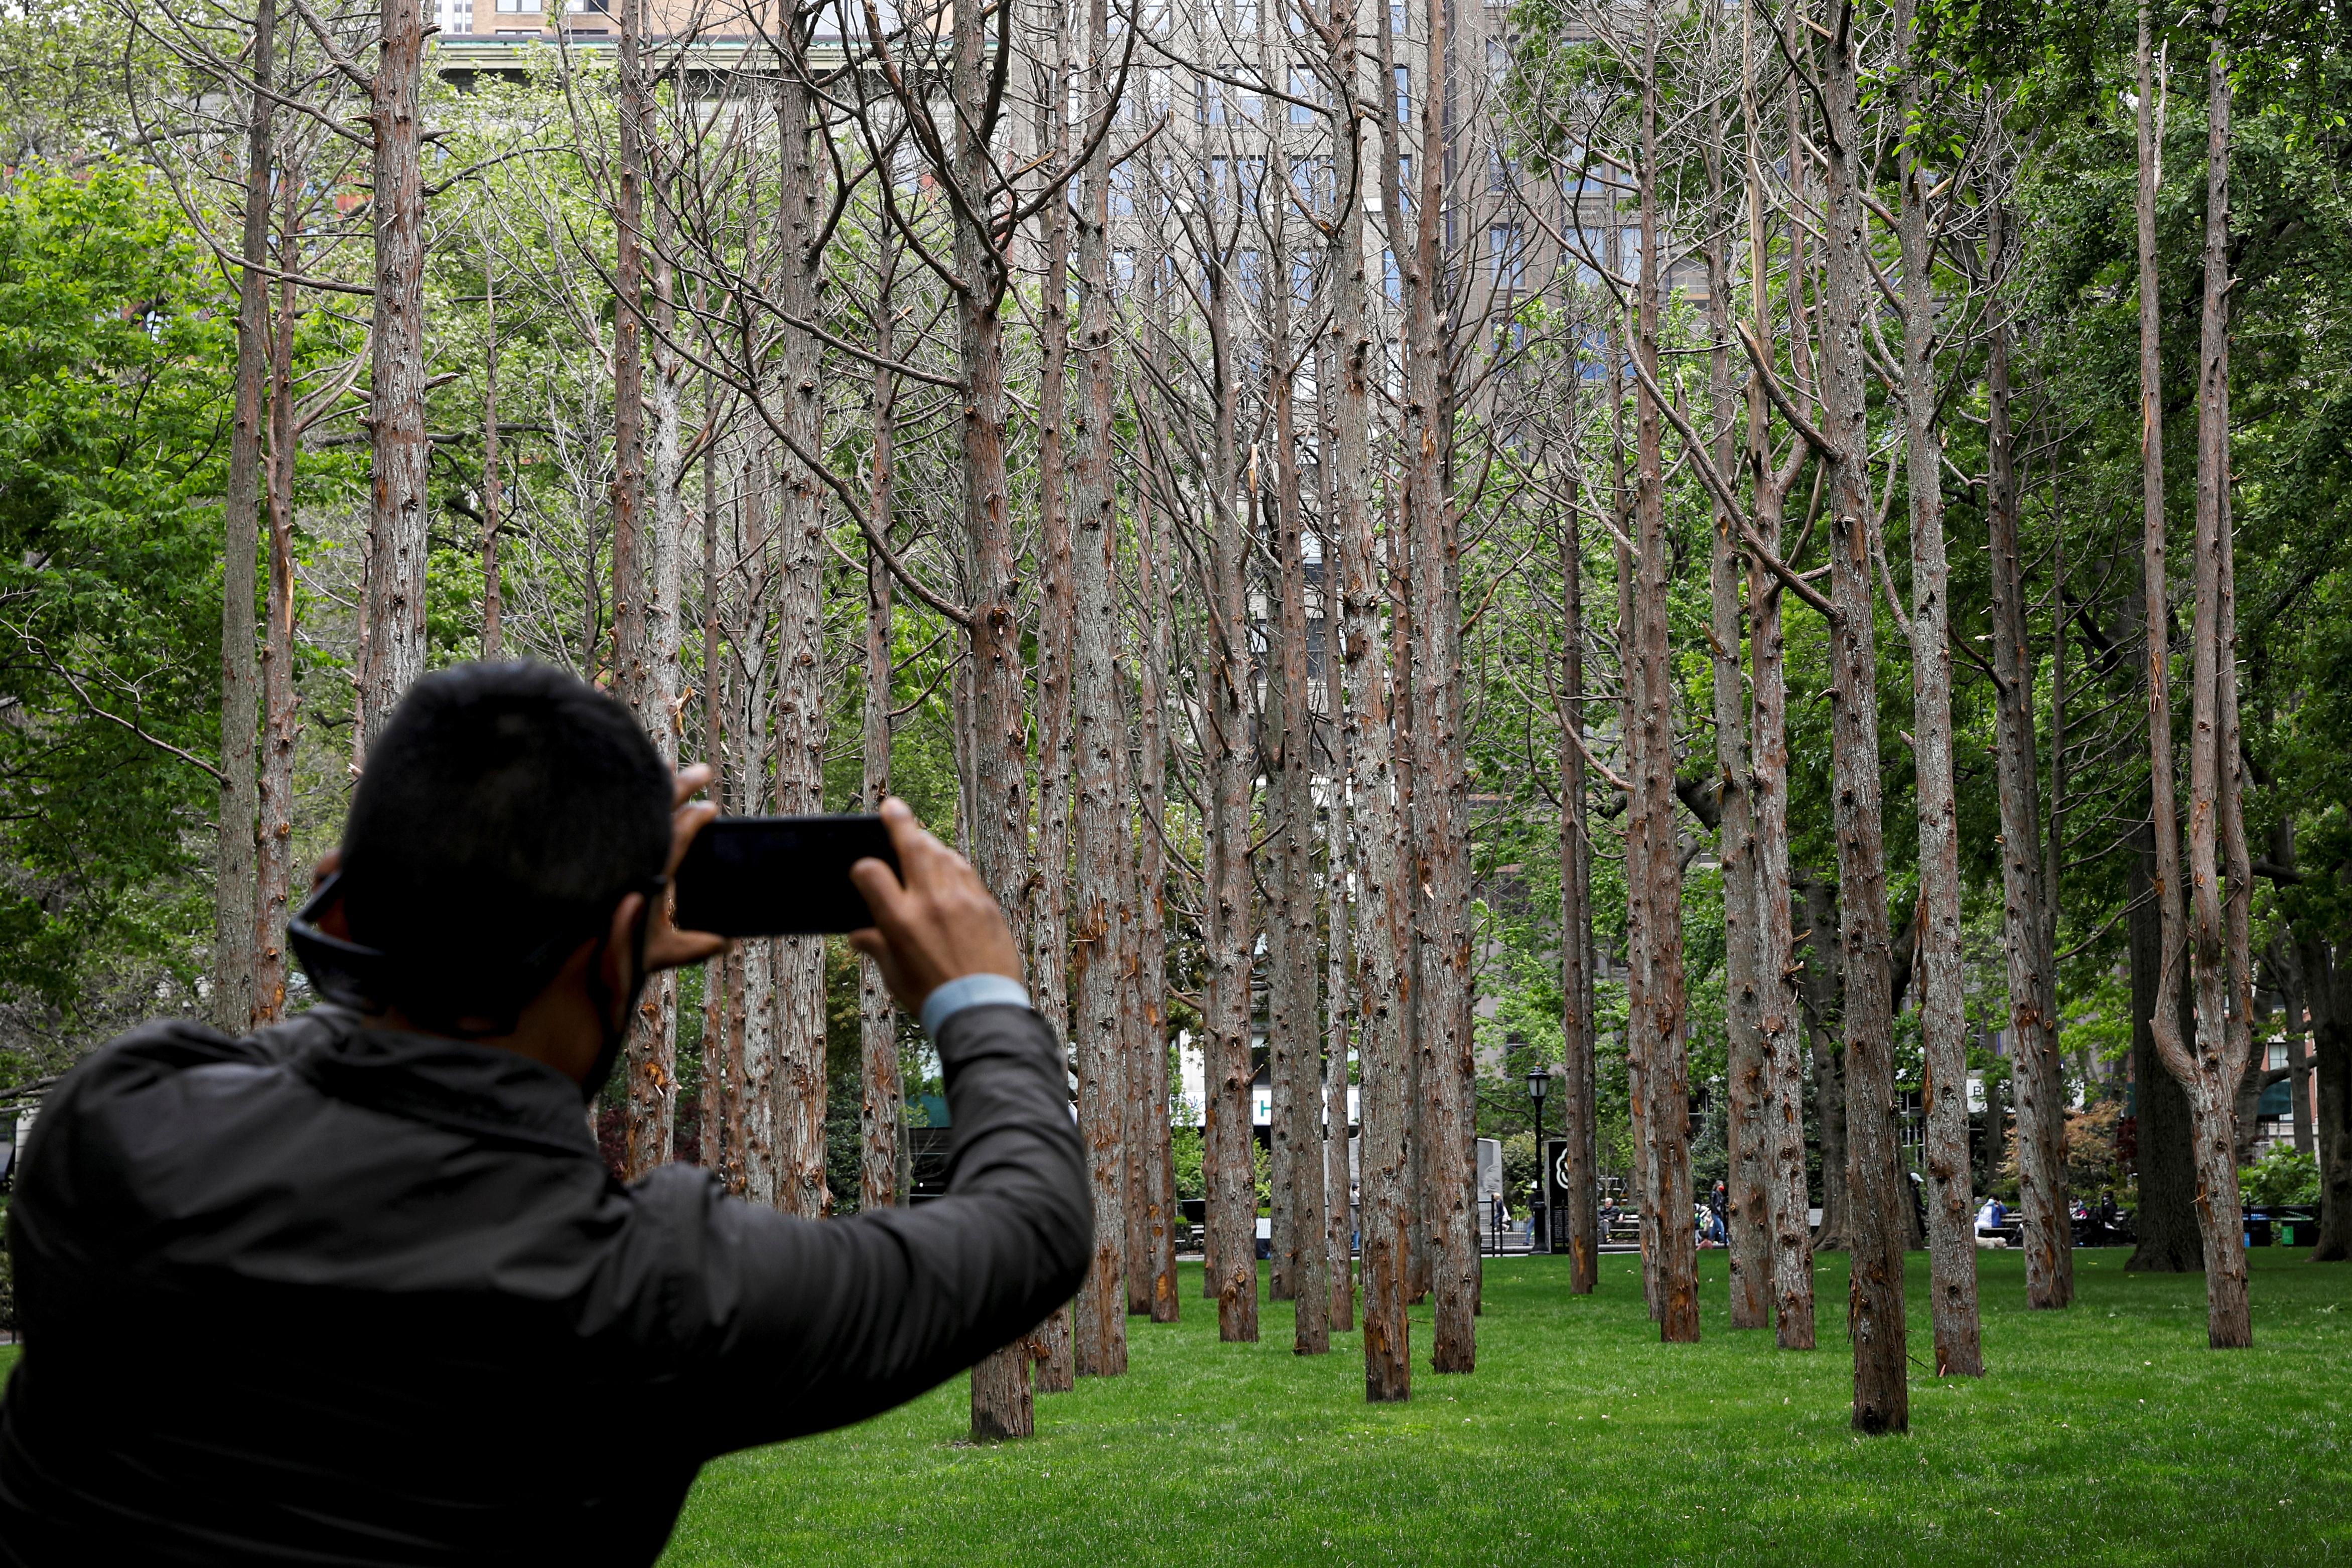 A man photographs